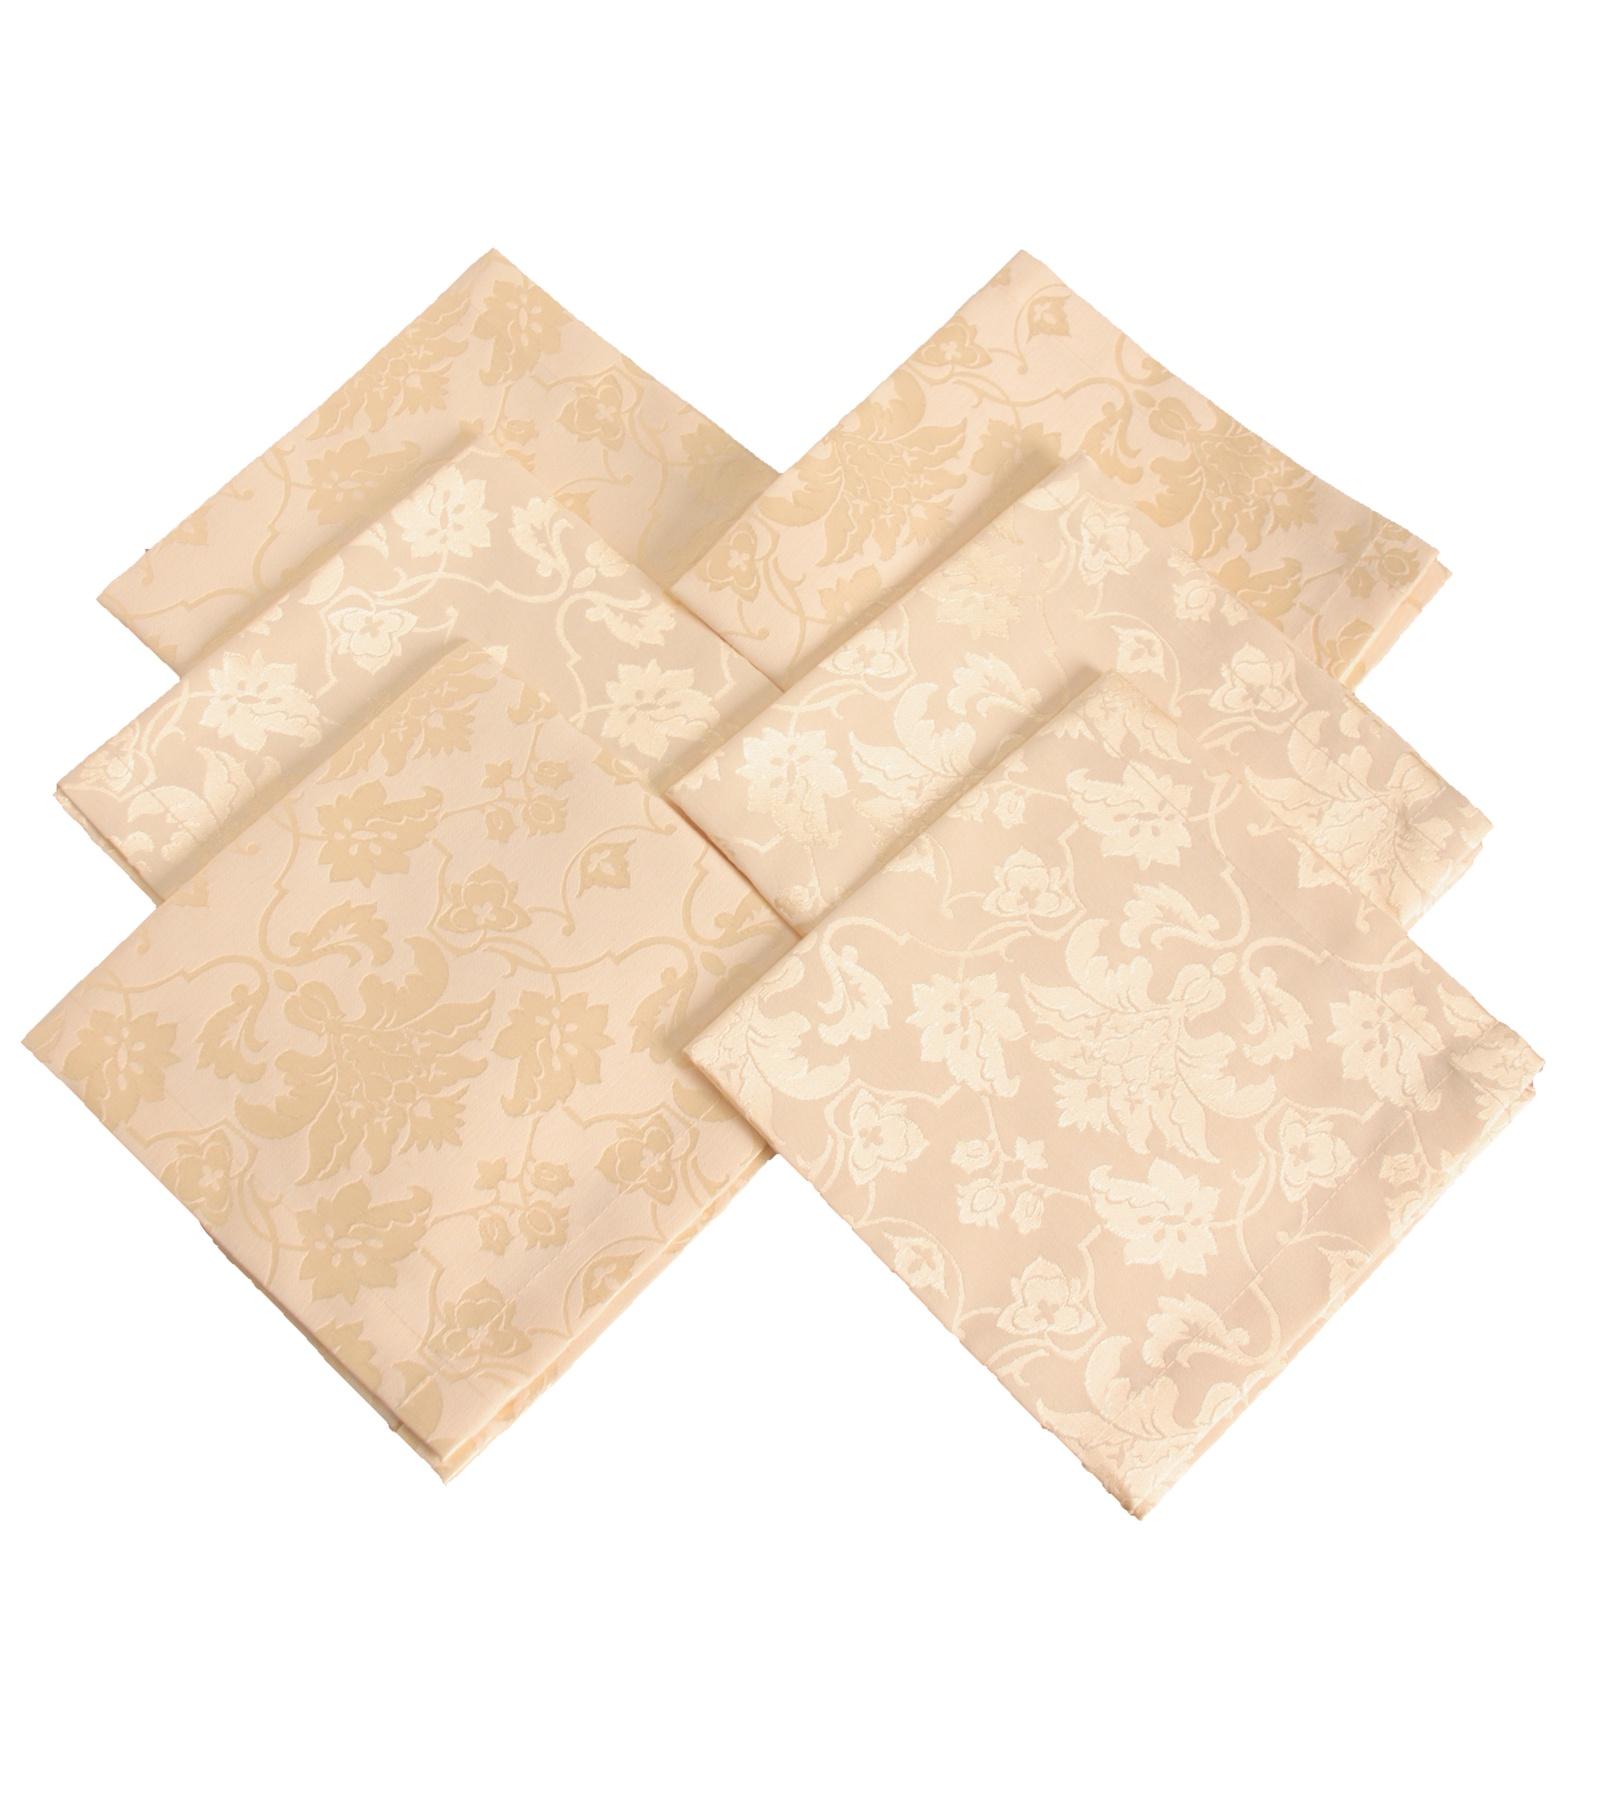 Салфетка столовая Naturel Шик салфетки, H18059-40x40-BB, бежевый цены онлайн